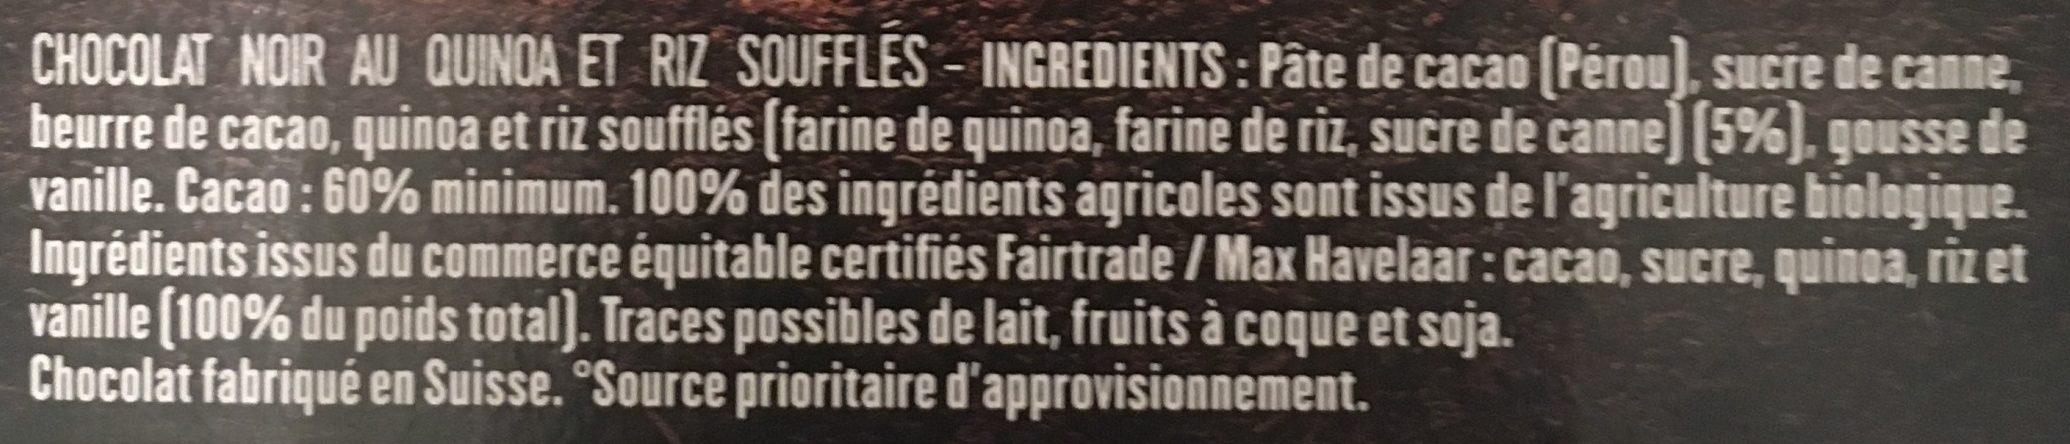 Chocolat Noir quinoa soufflé Bio - Ingrediënten